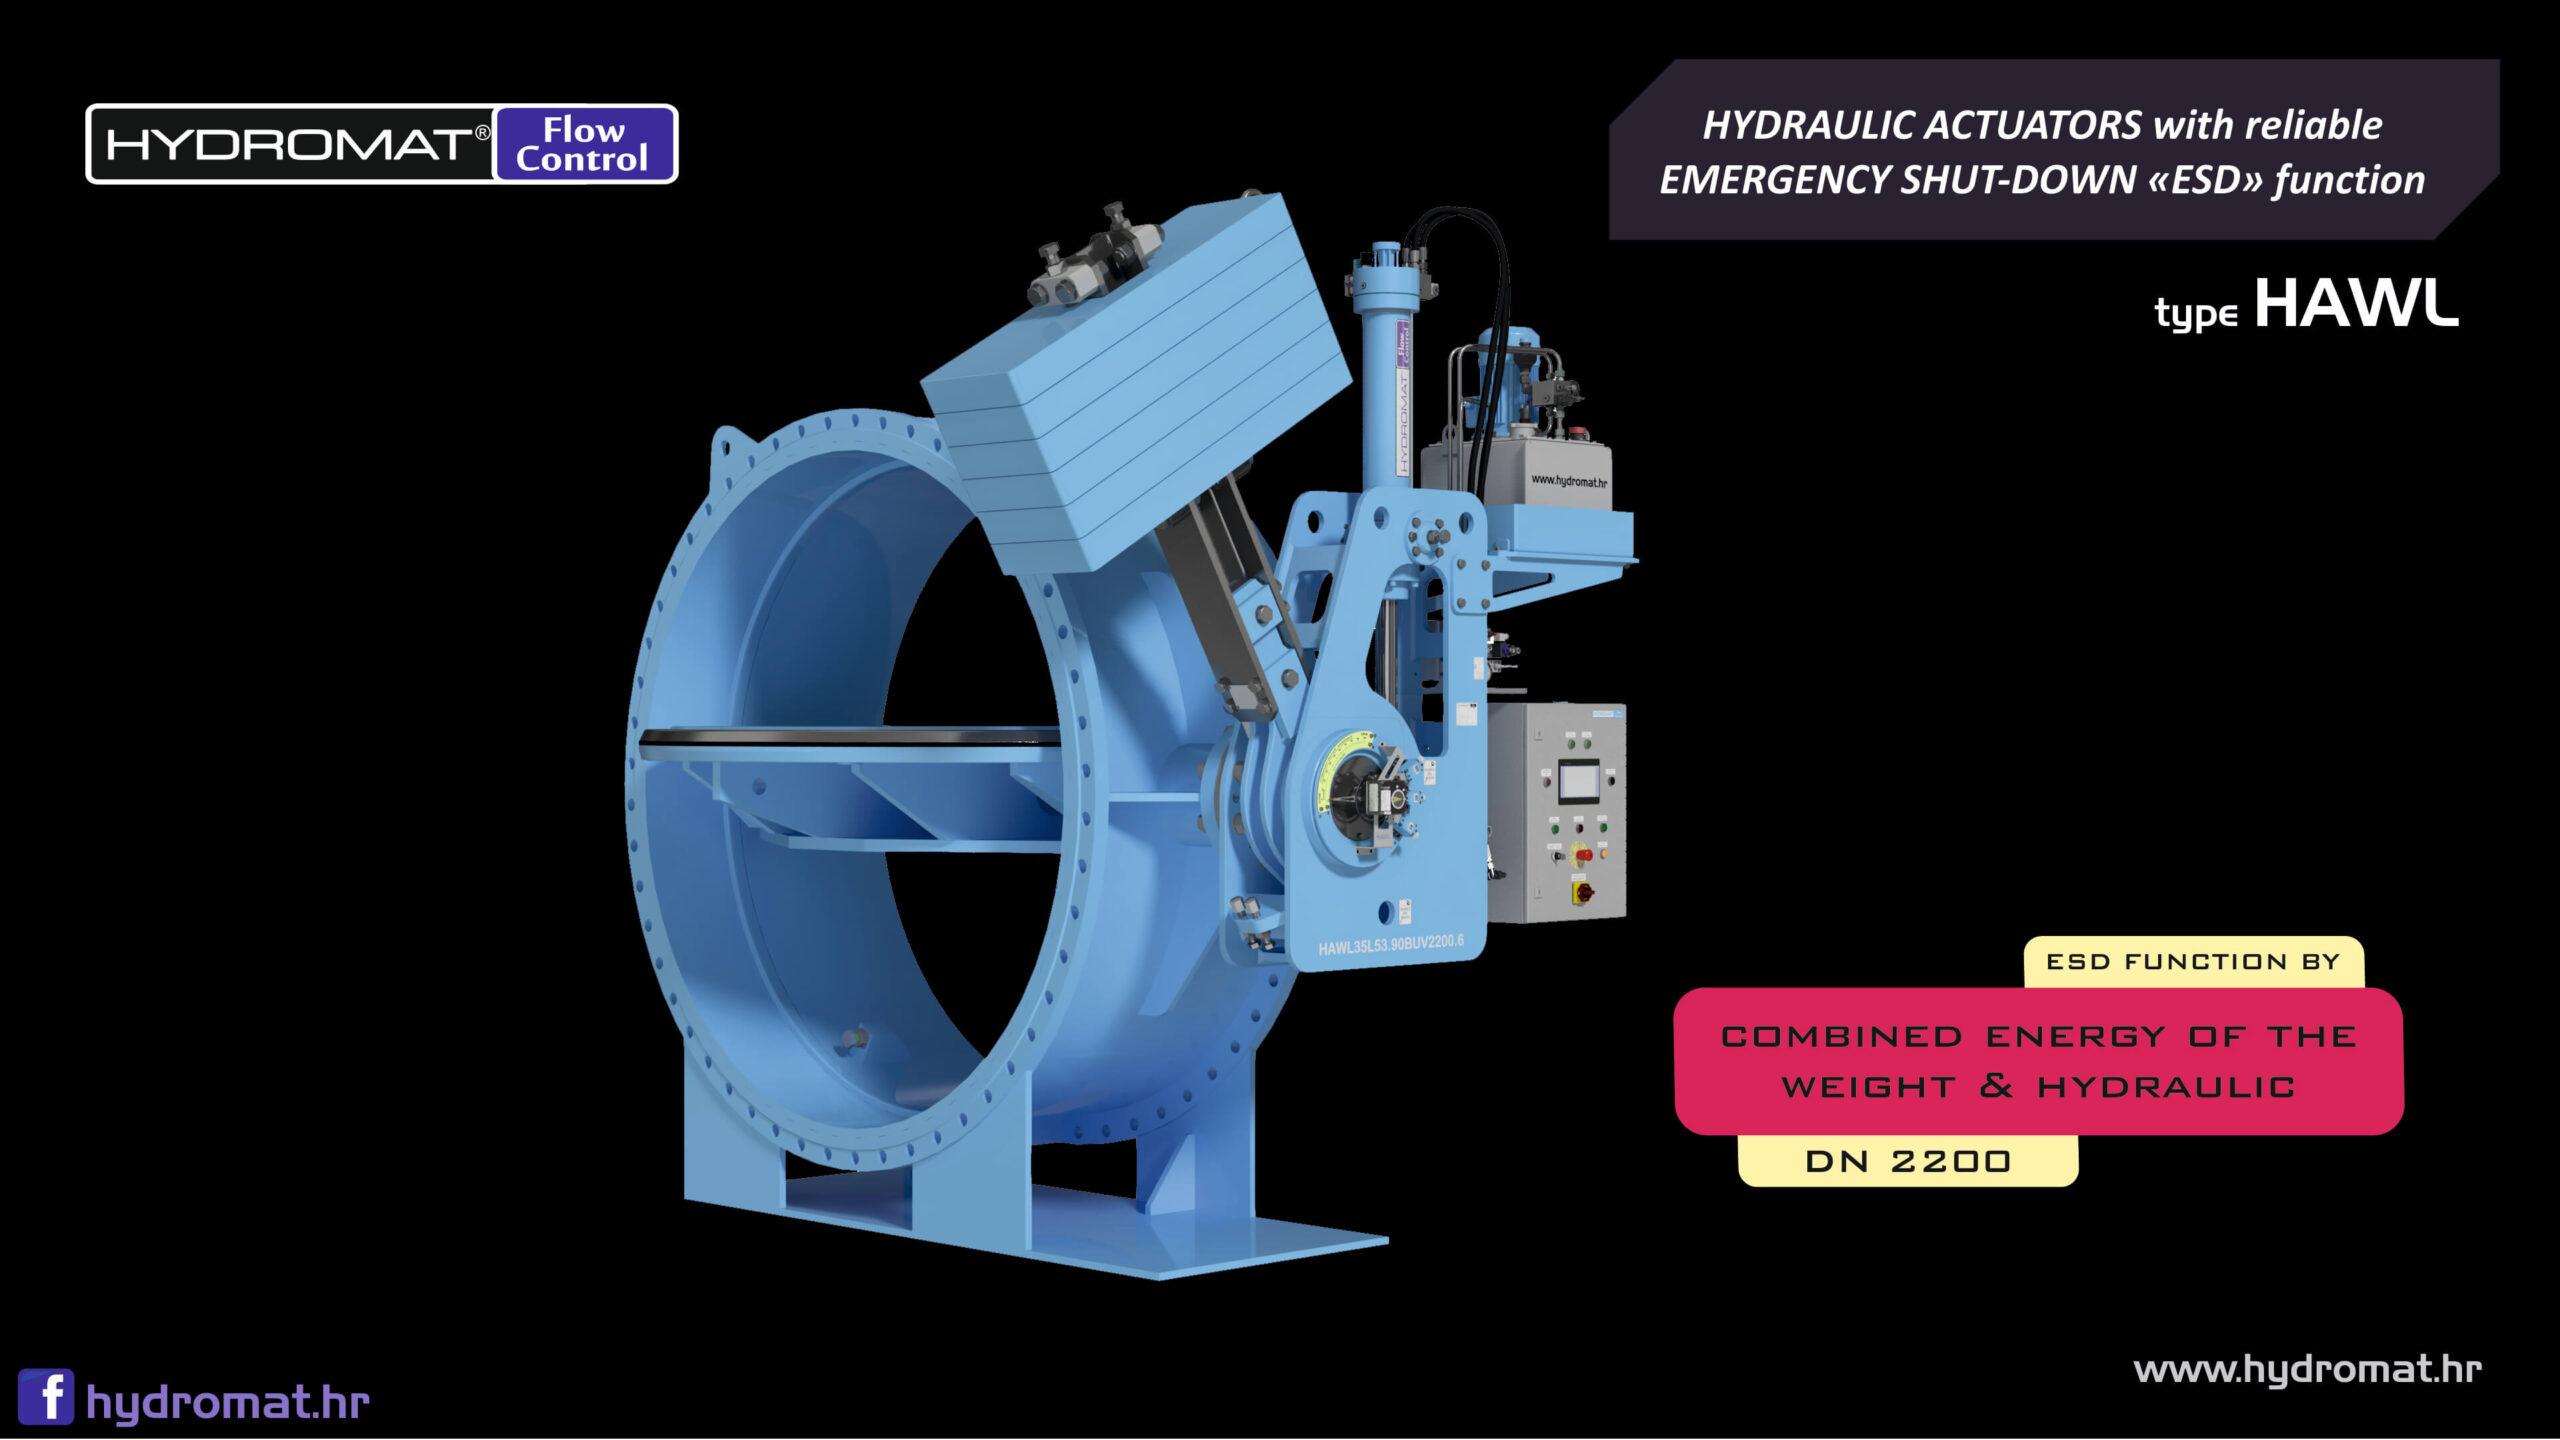 hydromat fluid actuators